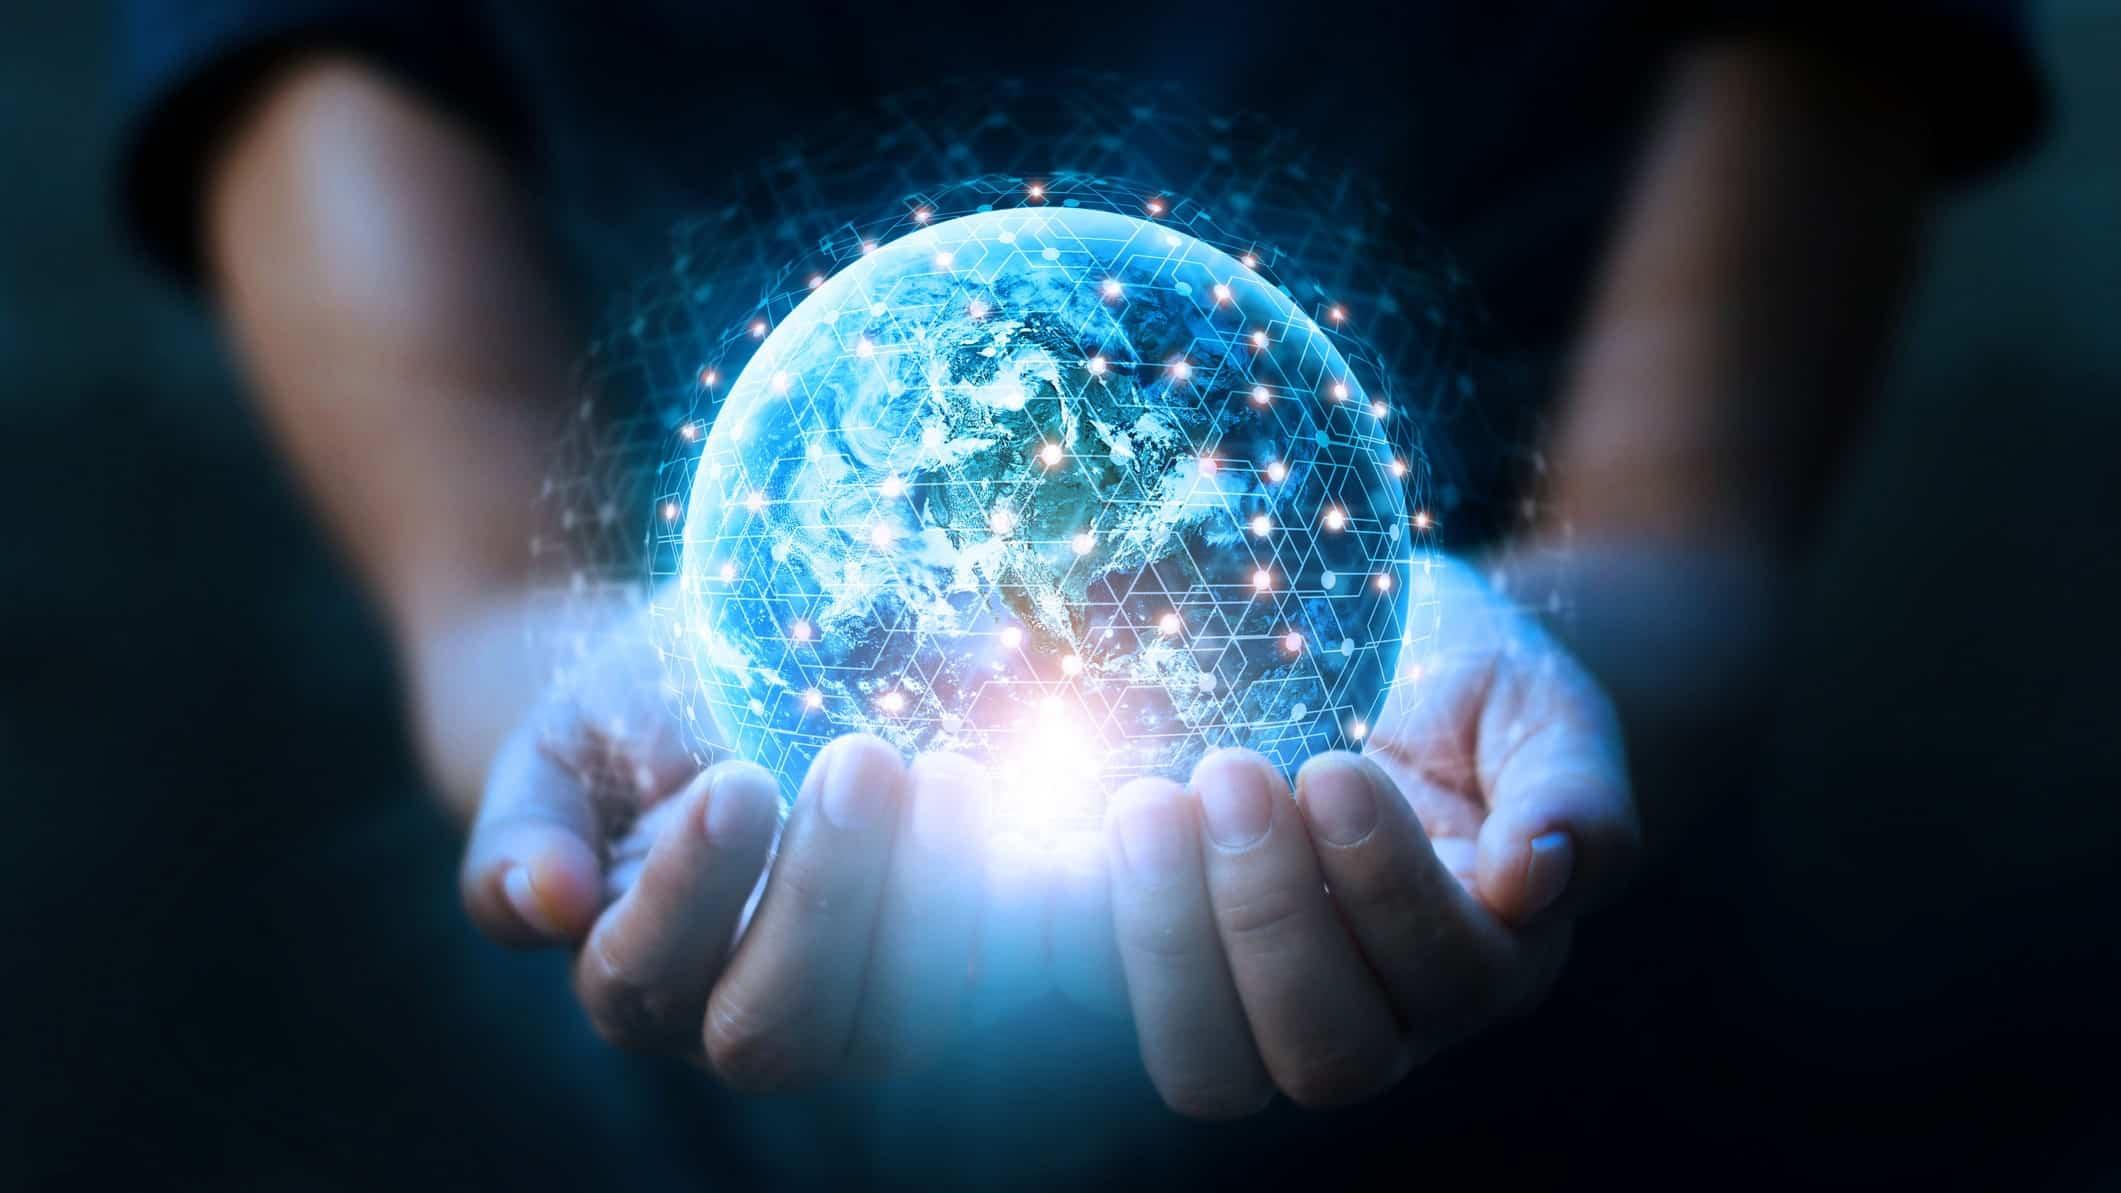 Global technology shares